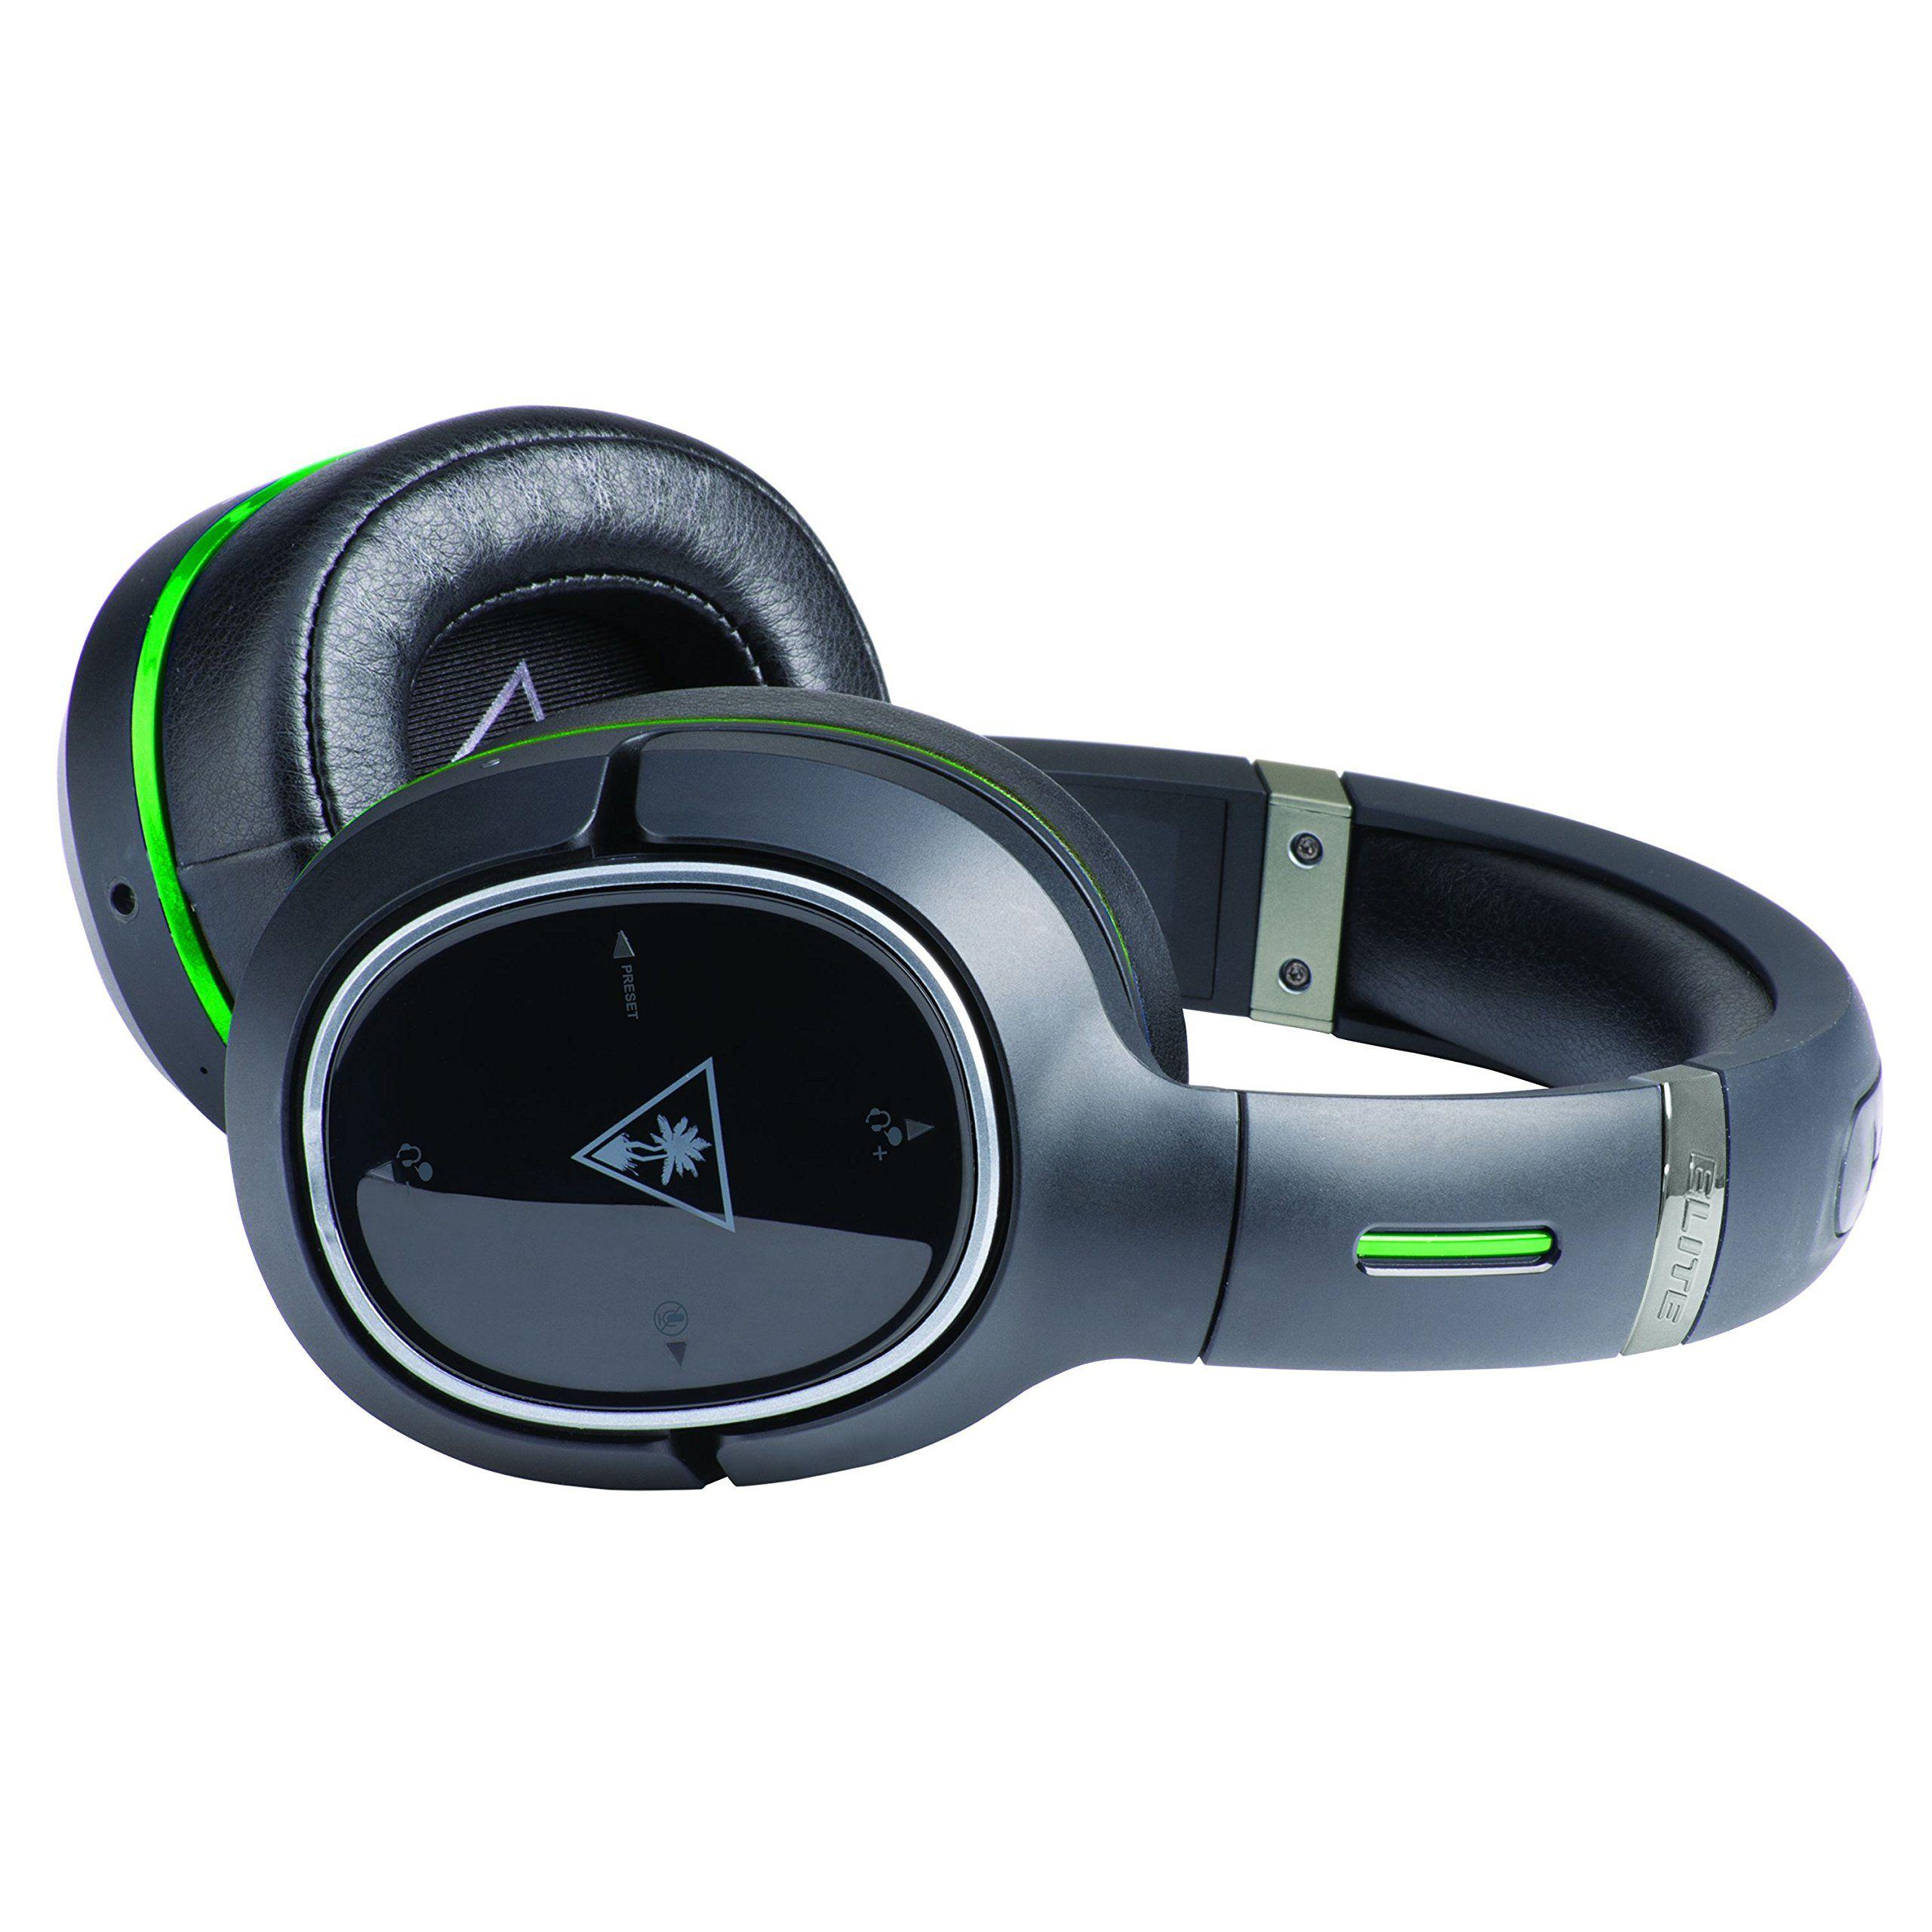 Turtle Beach Ear Force Elite 800X Premium Fully Wireless Gaming